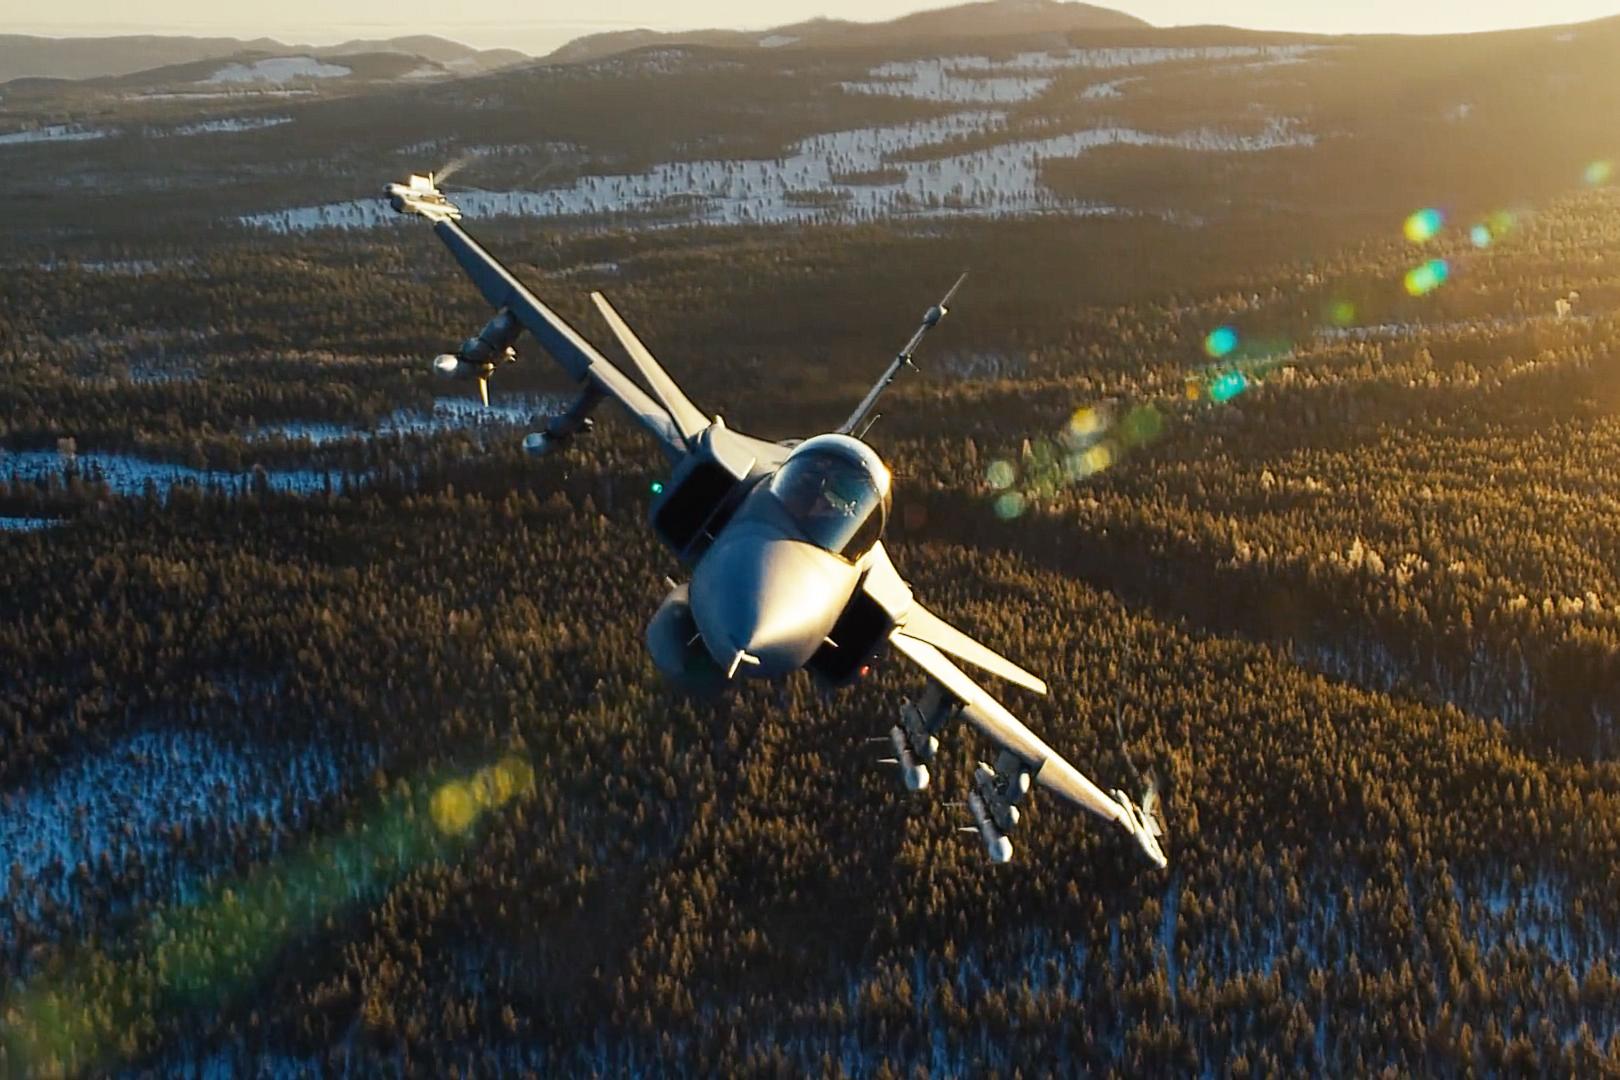 This Rock-Solid Gripen Jet Footage Was Shot at Breakneck Speeds